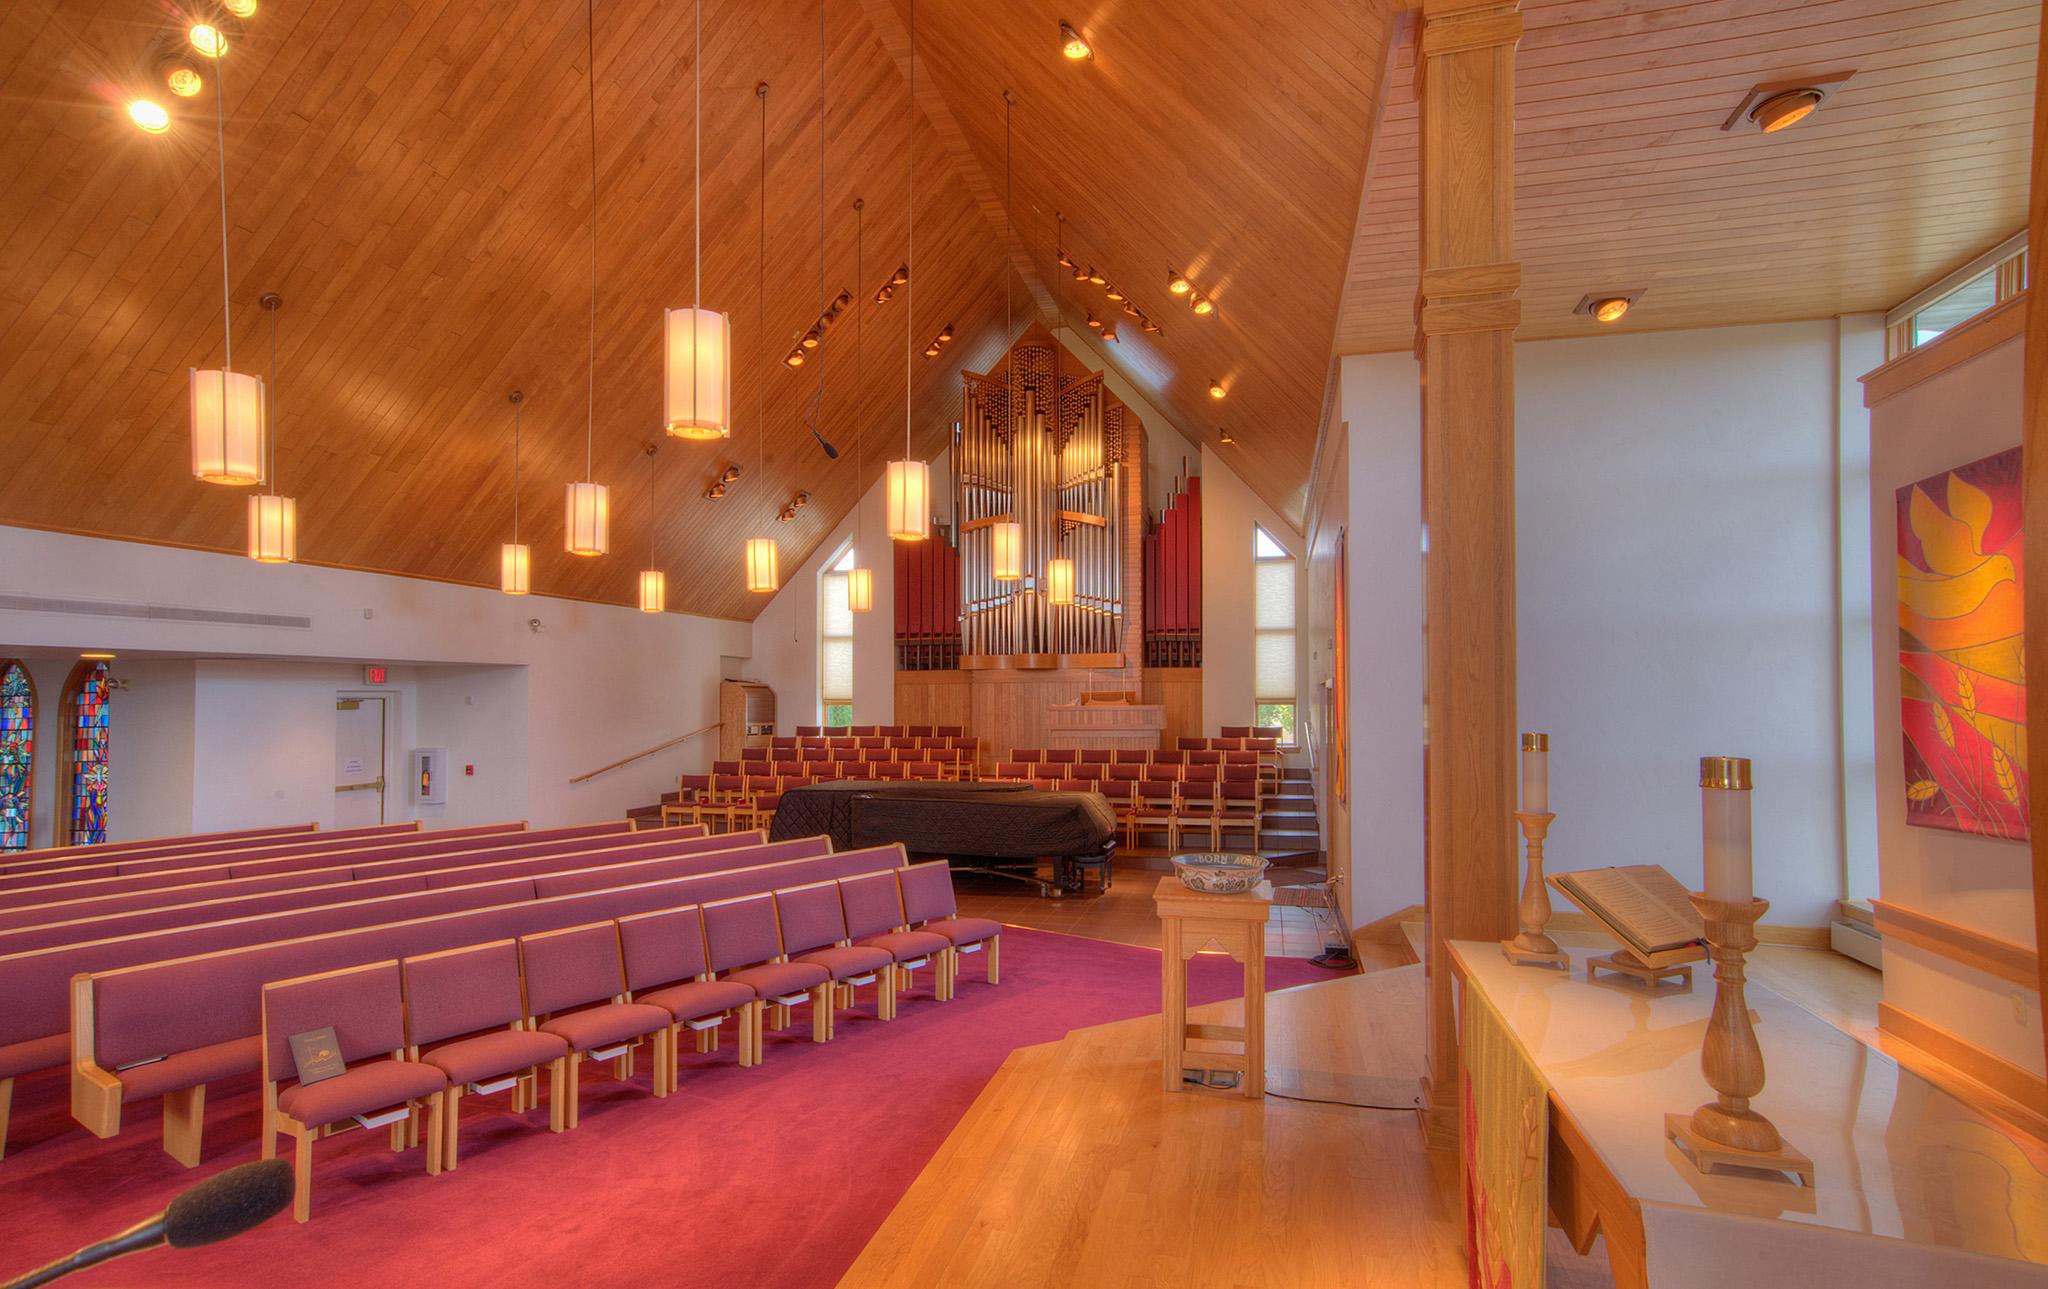 2_Shepherd of the Bay Lutheran Church